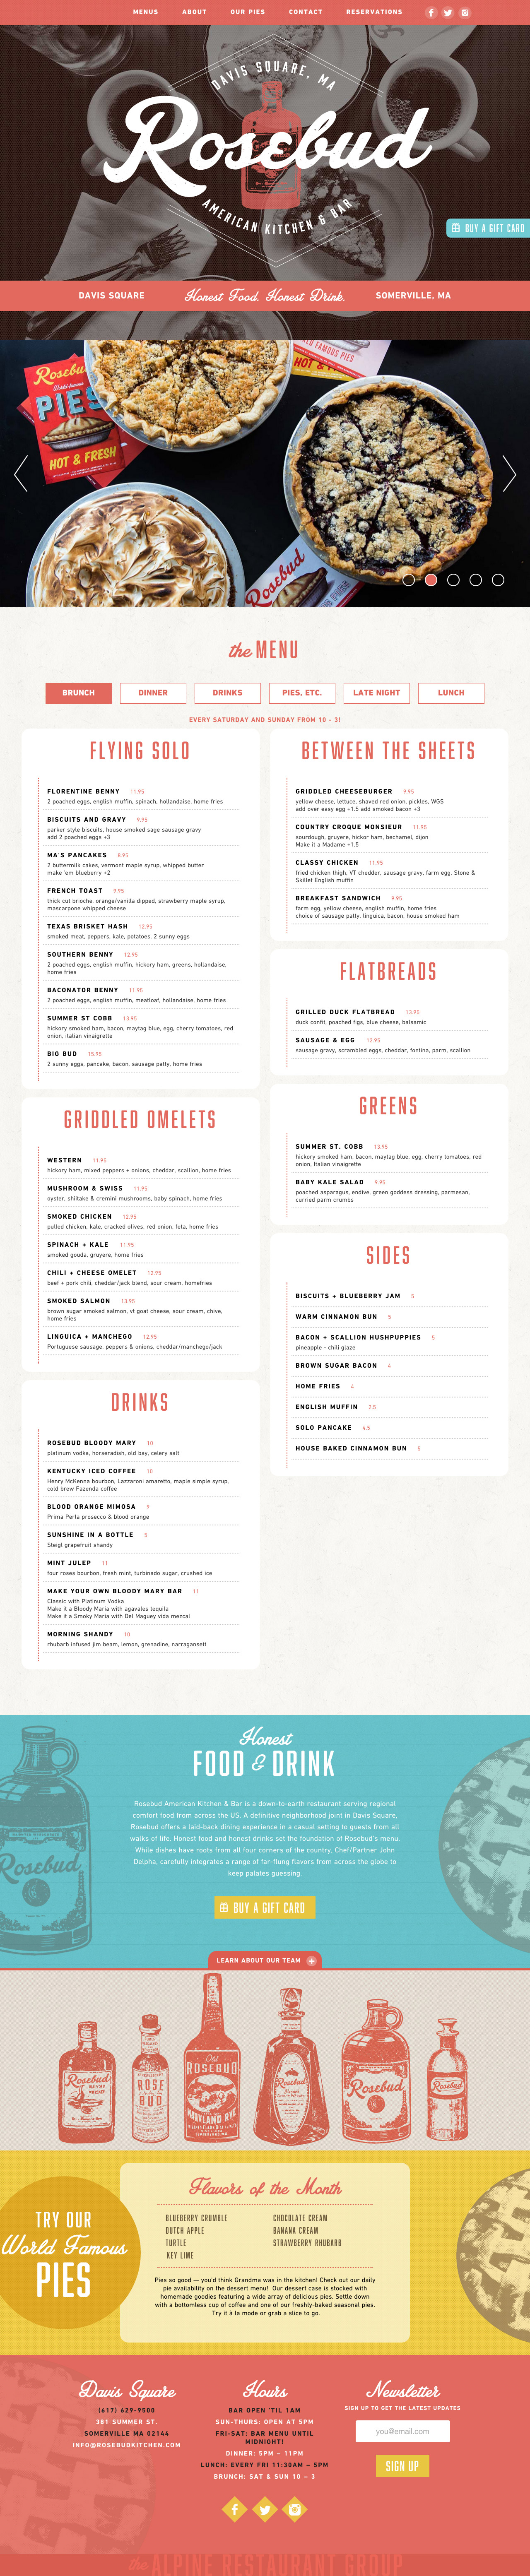 Rosebud American Kitchen & Bar Website Screenshot